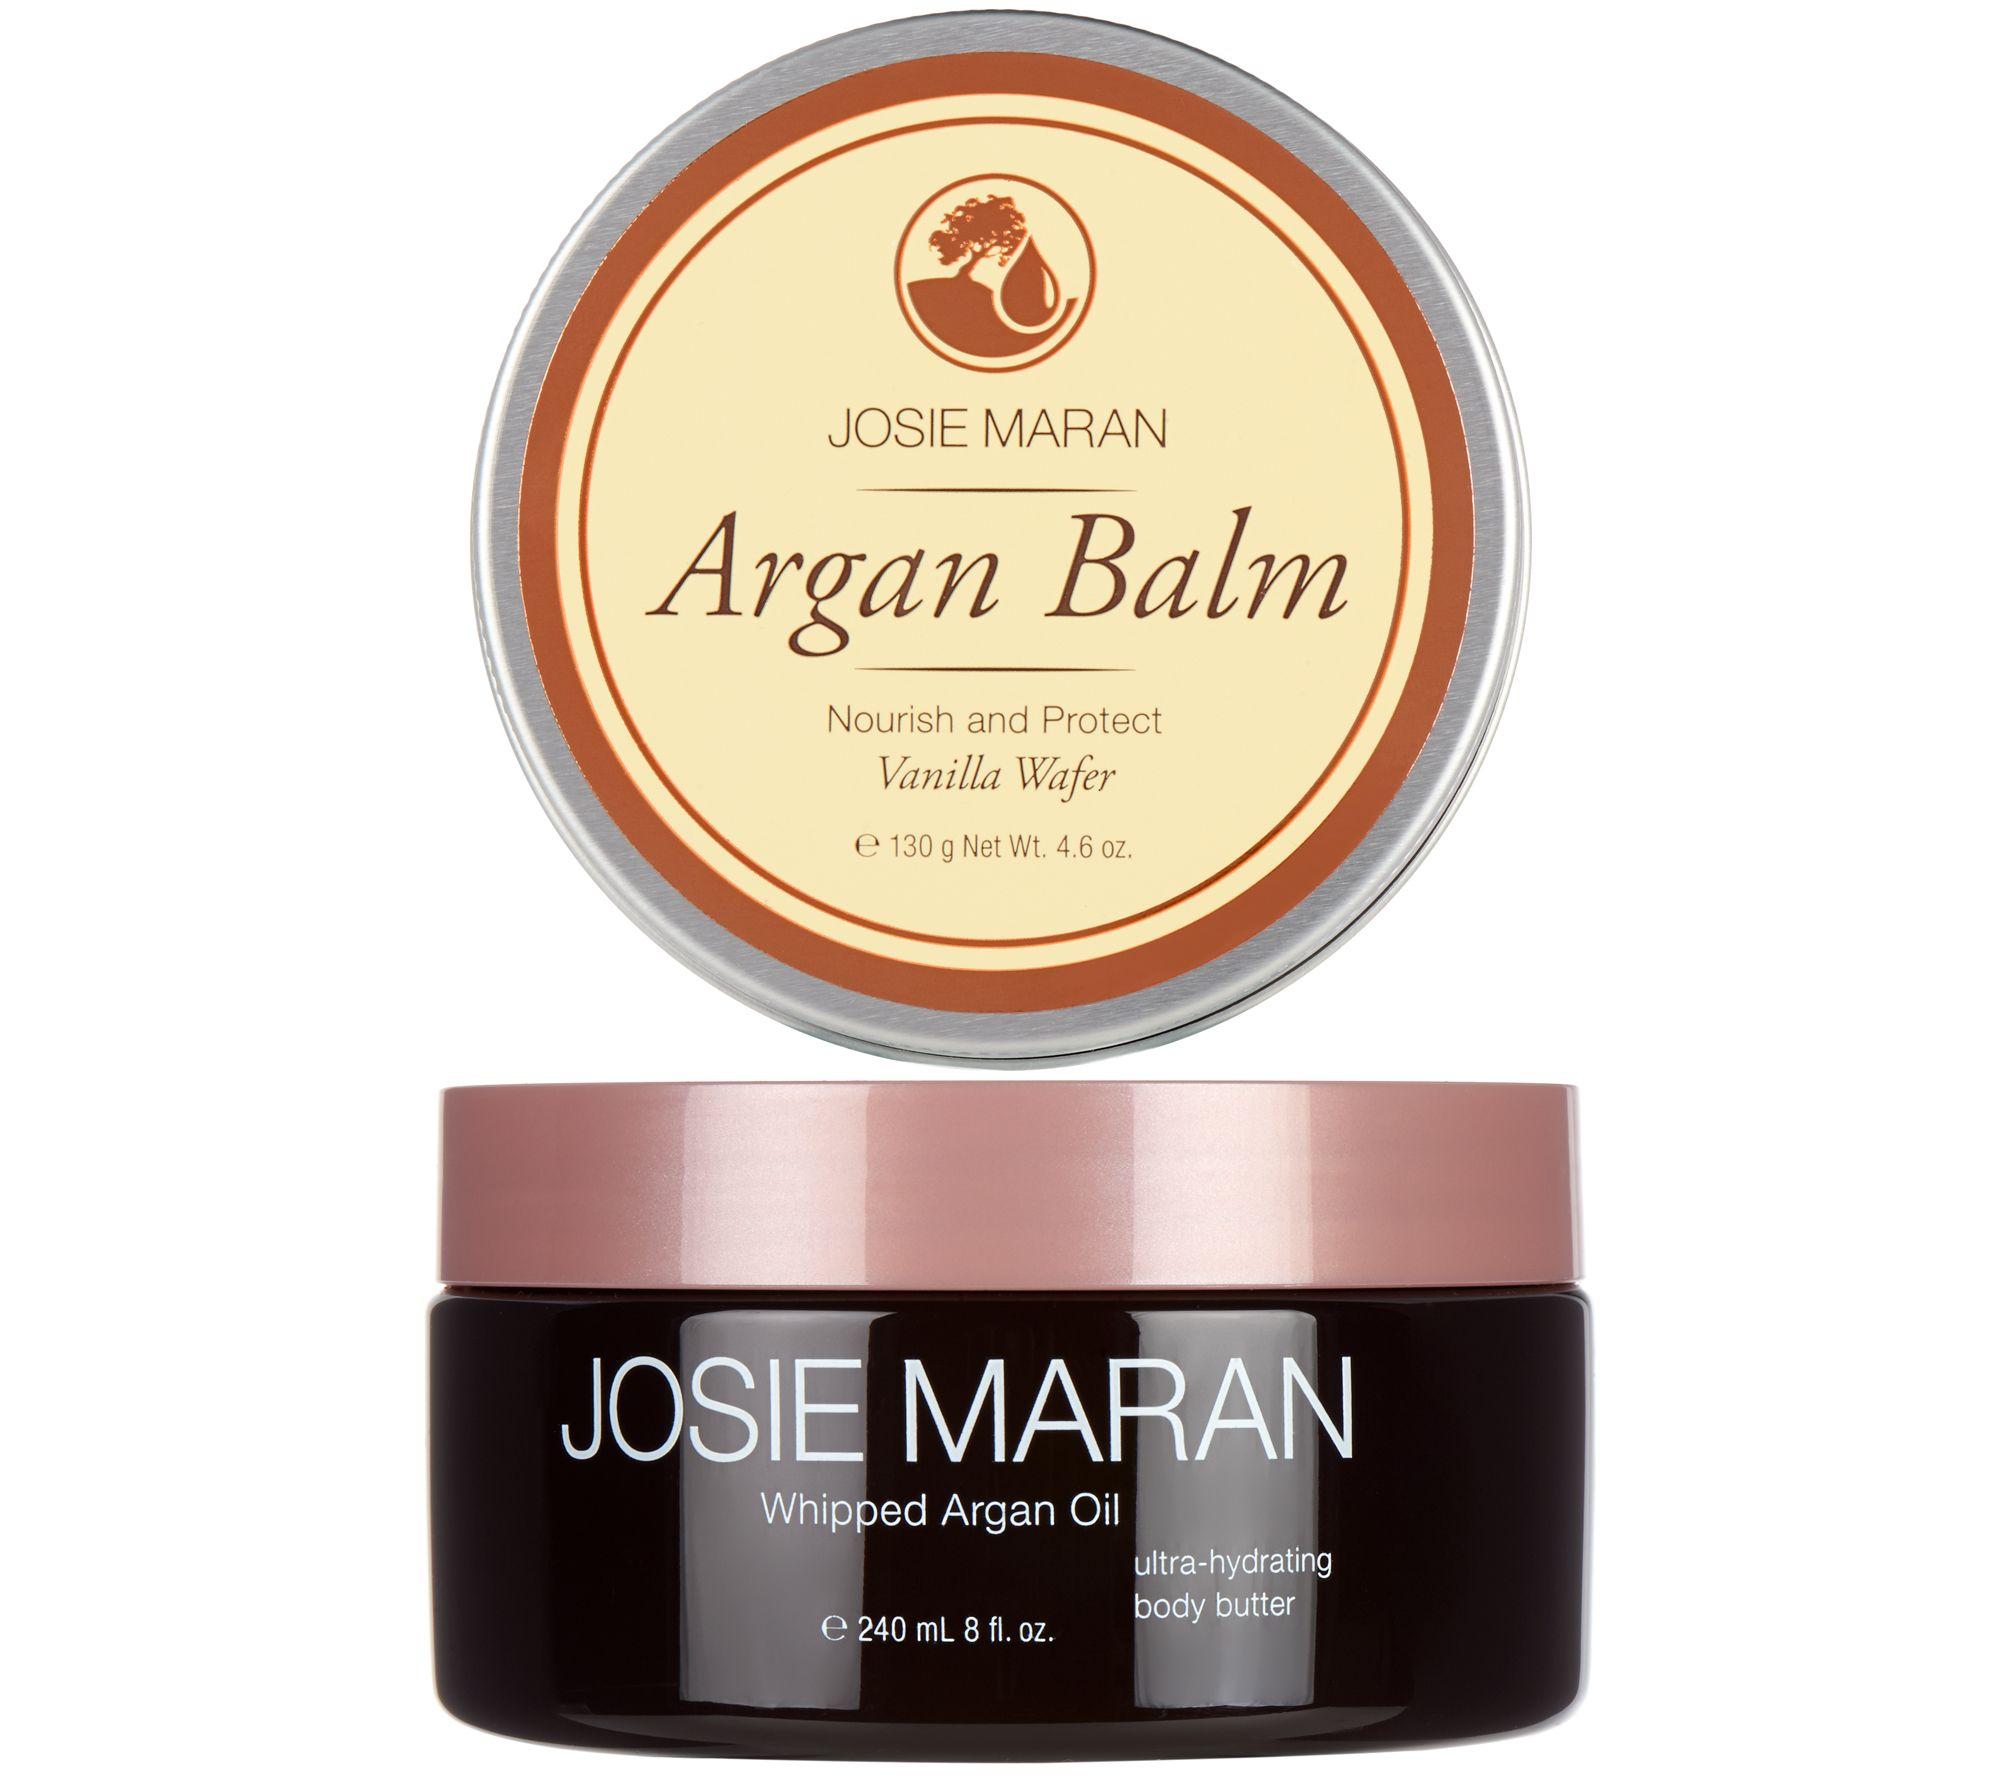 josie maran body butter balm duo in vanilla wafer page 1. Black Bedroom Furniture Sets. Home Design Ideas